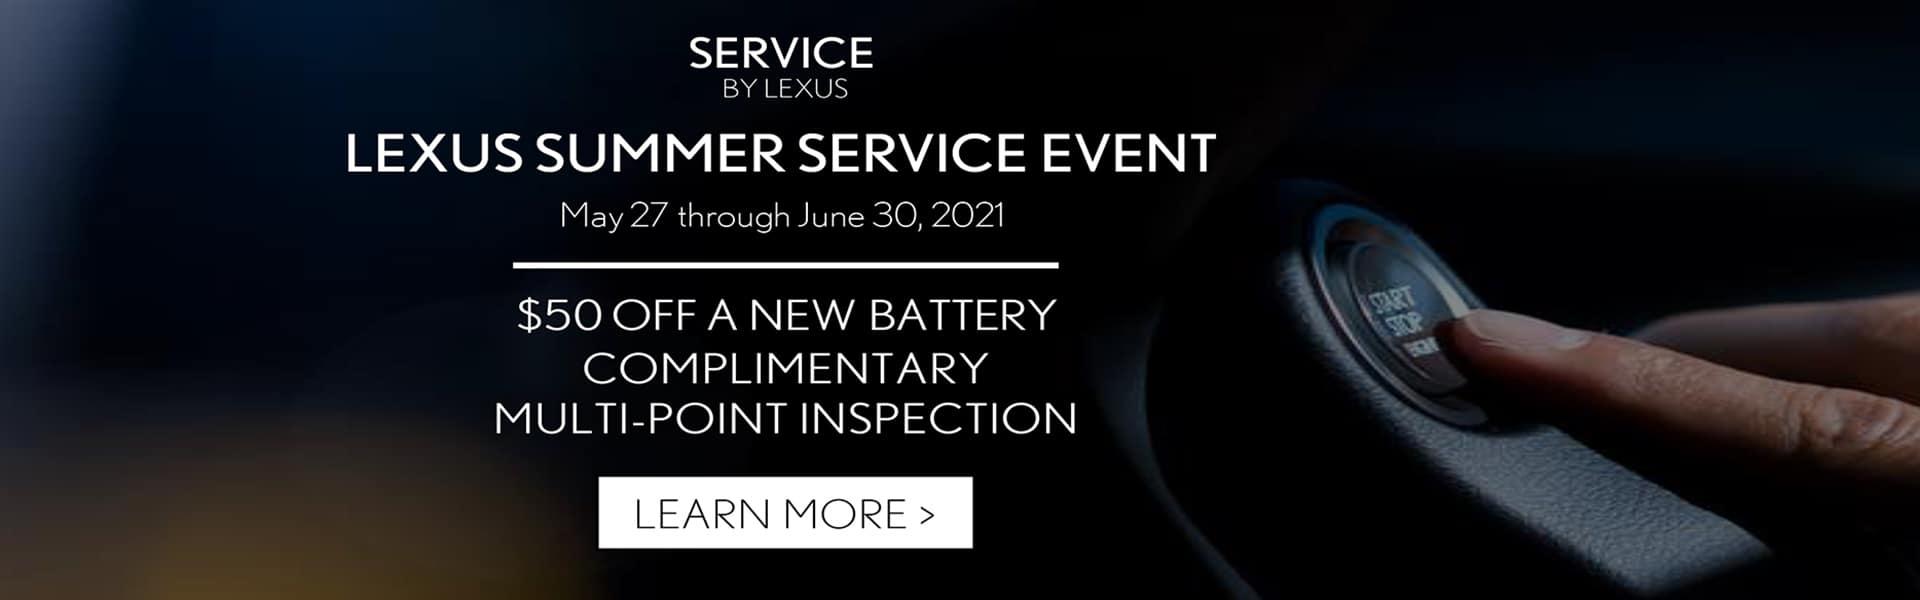 Lexus Summer Service Banner